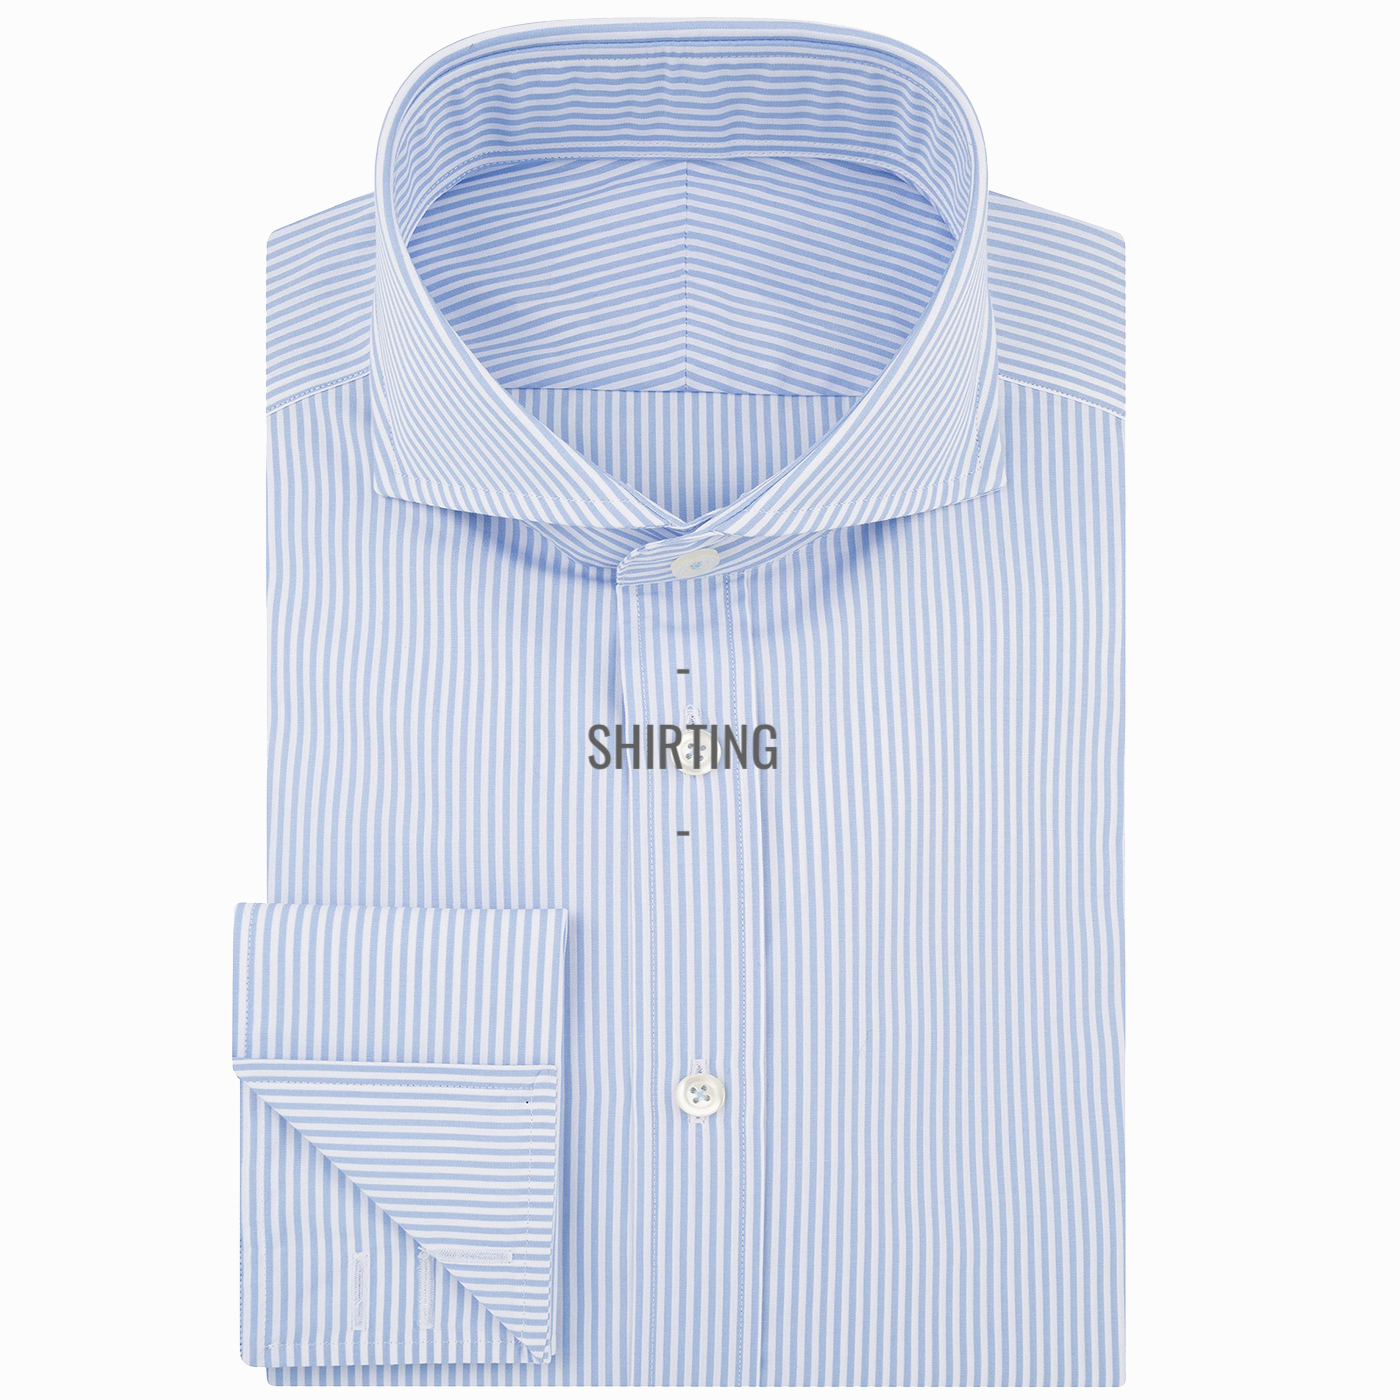 Shirt_24_Wills-stripe_sky copy.jpg